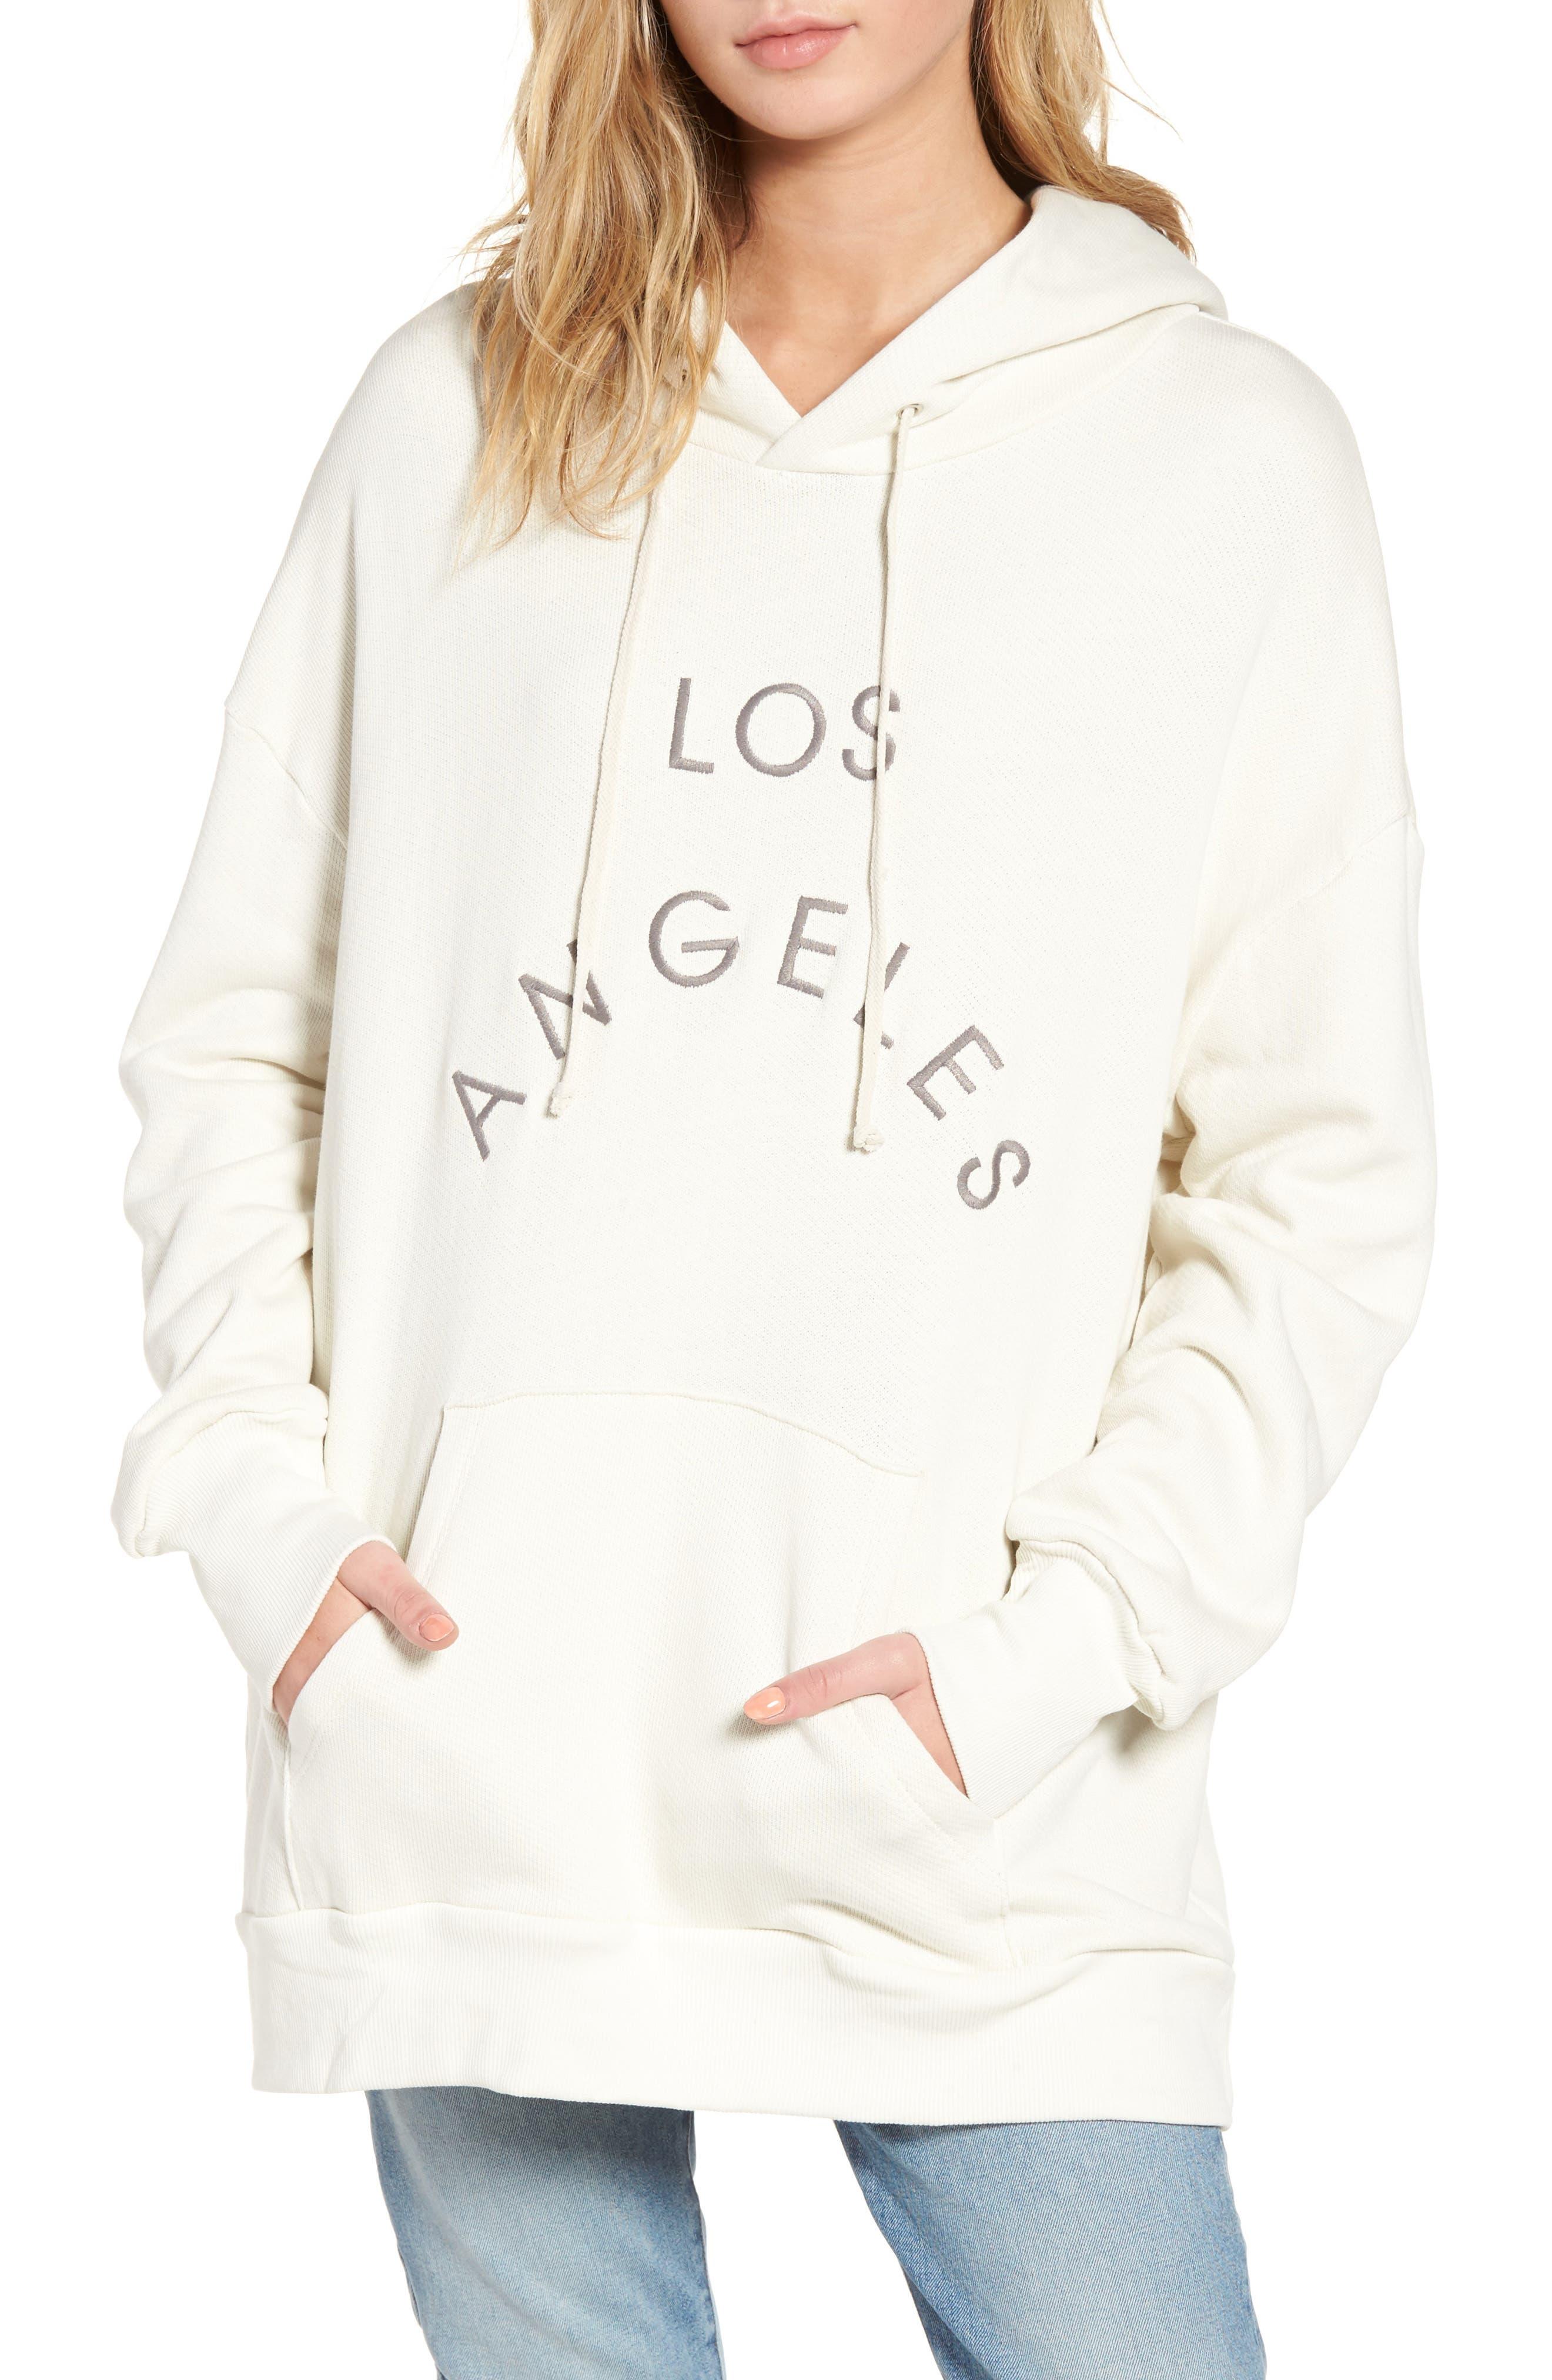 Los Angeles Oversize Hoodie,                         Main,                         color, Vintage Lace